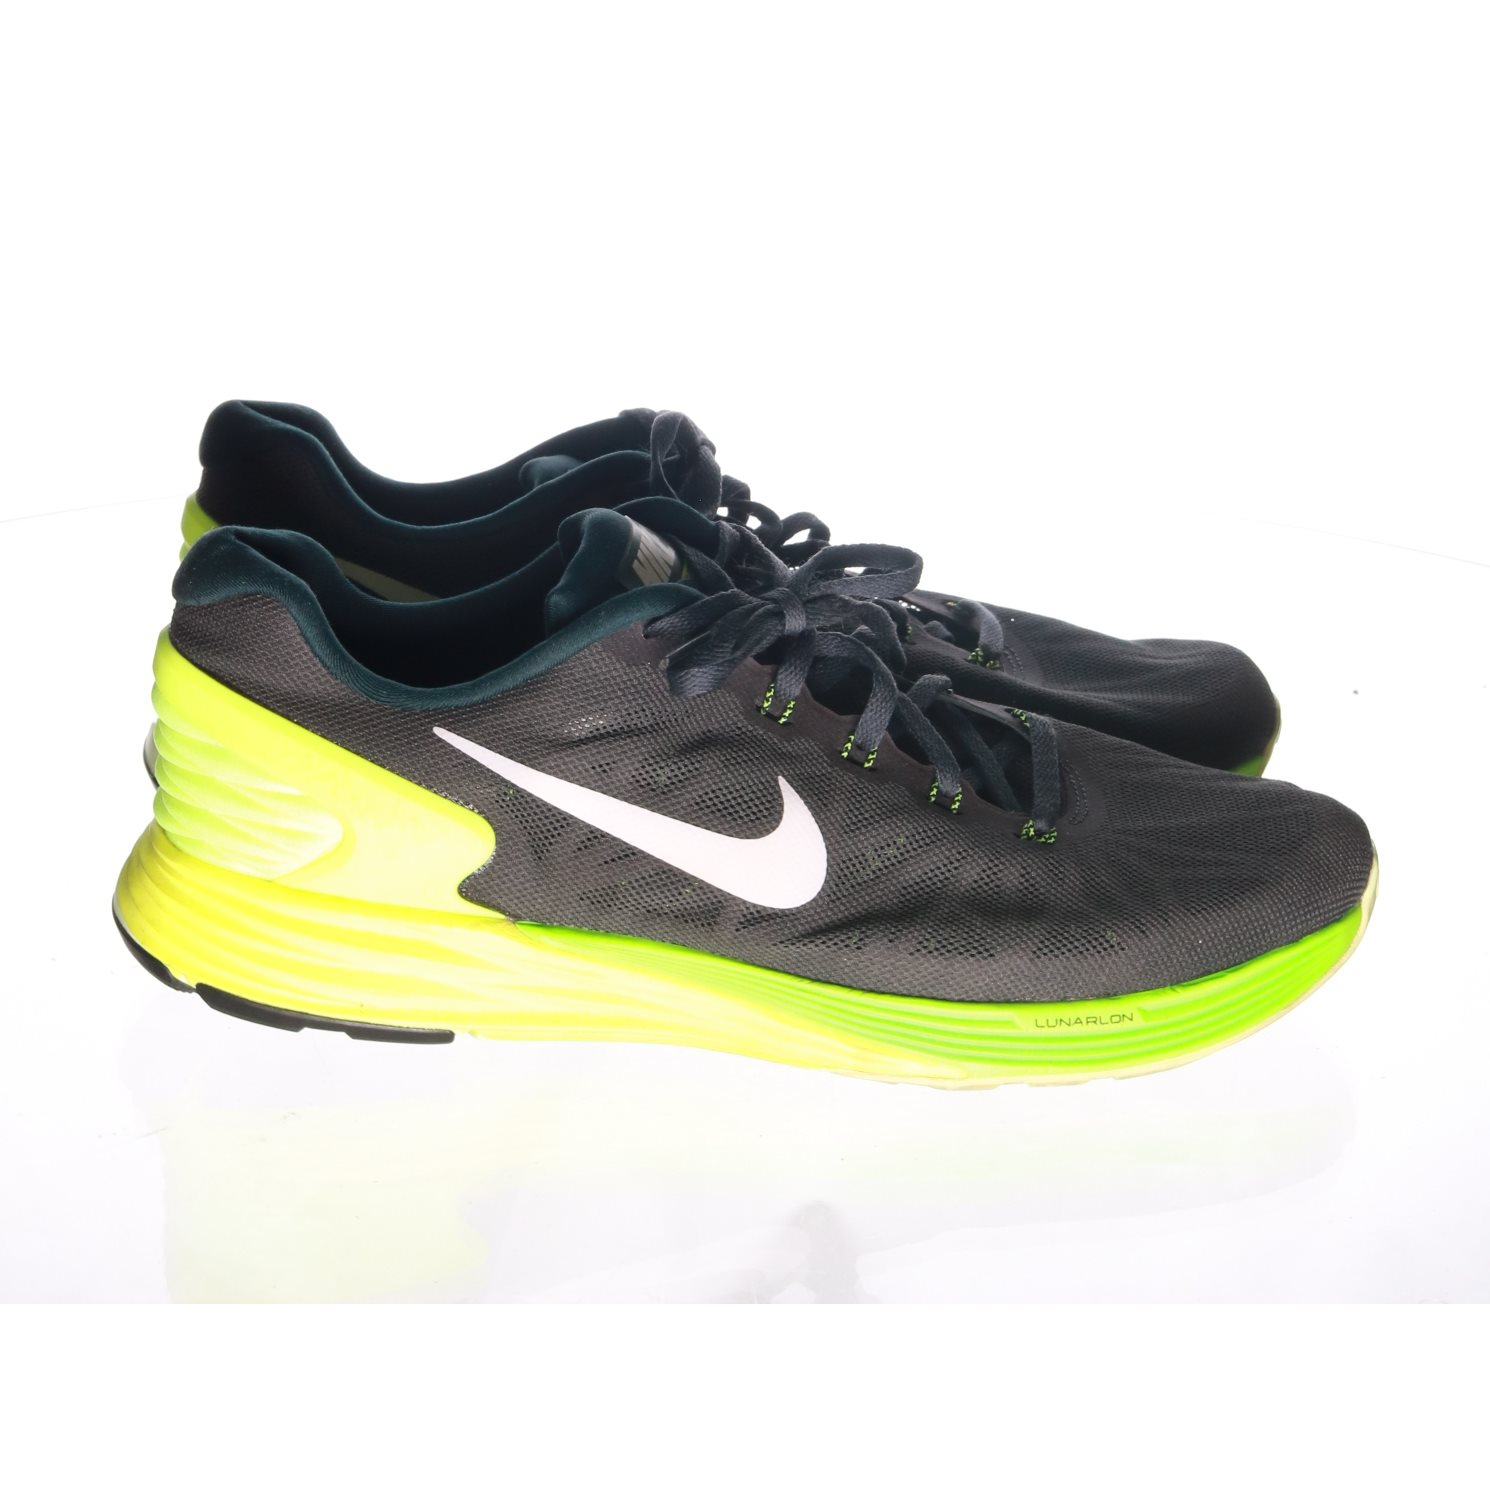 check out ba07b fbaac ... grå svarta uc84652h652 f287b b2e99 france nike sneakers lunarglide 6  strl 45 gul grön svart 2627a 9ba0b ...